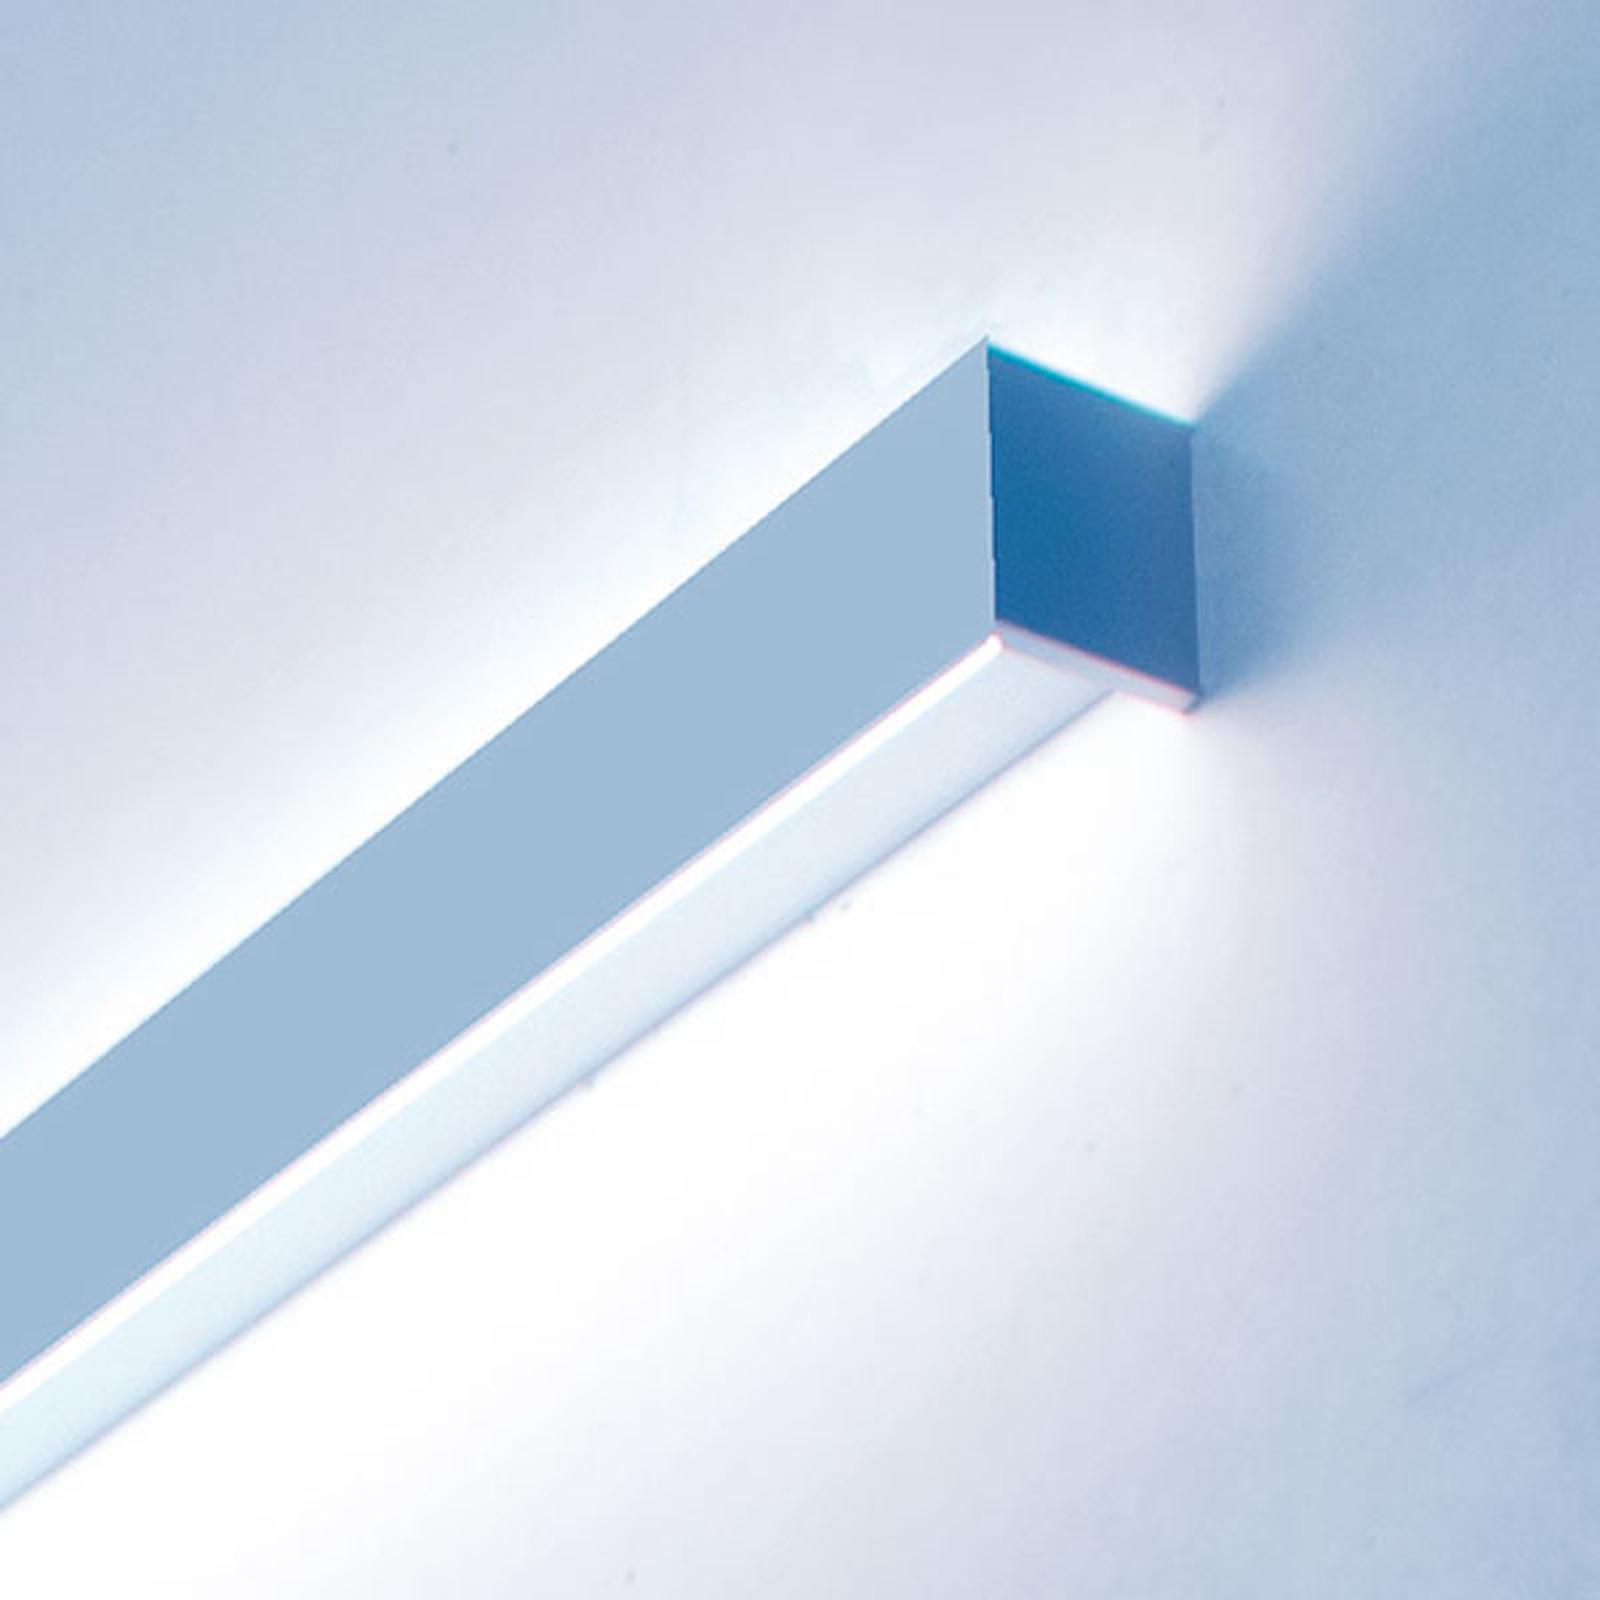 Applique LED Matric W1 264cm, 3000K